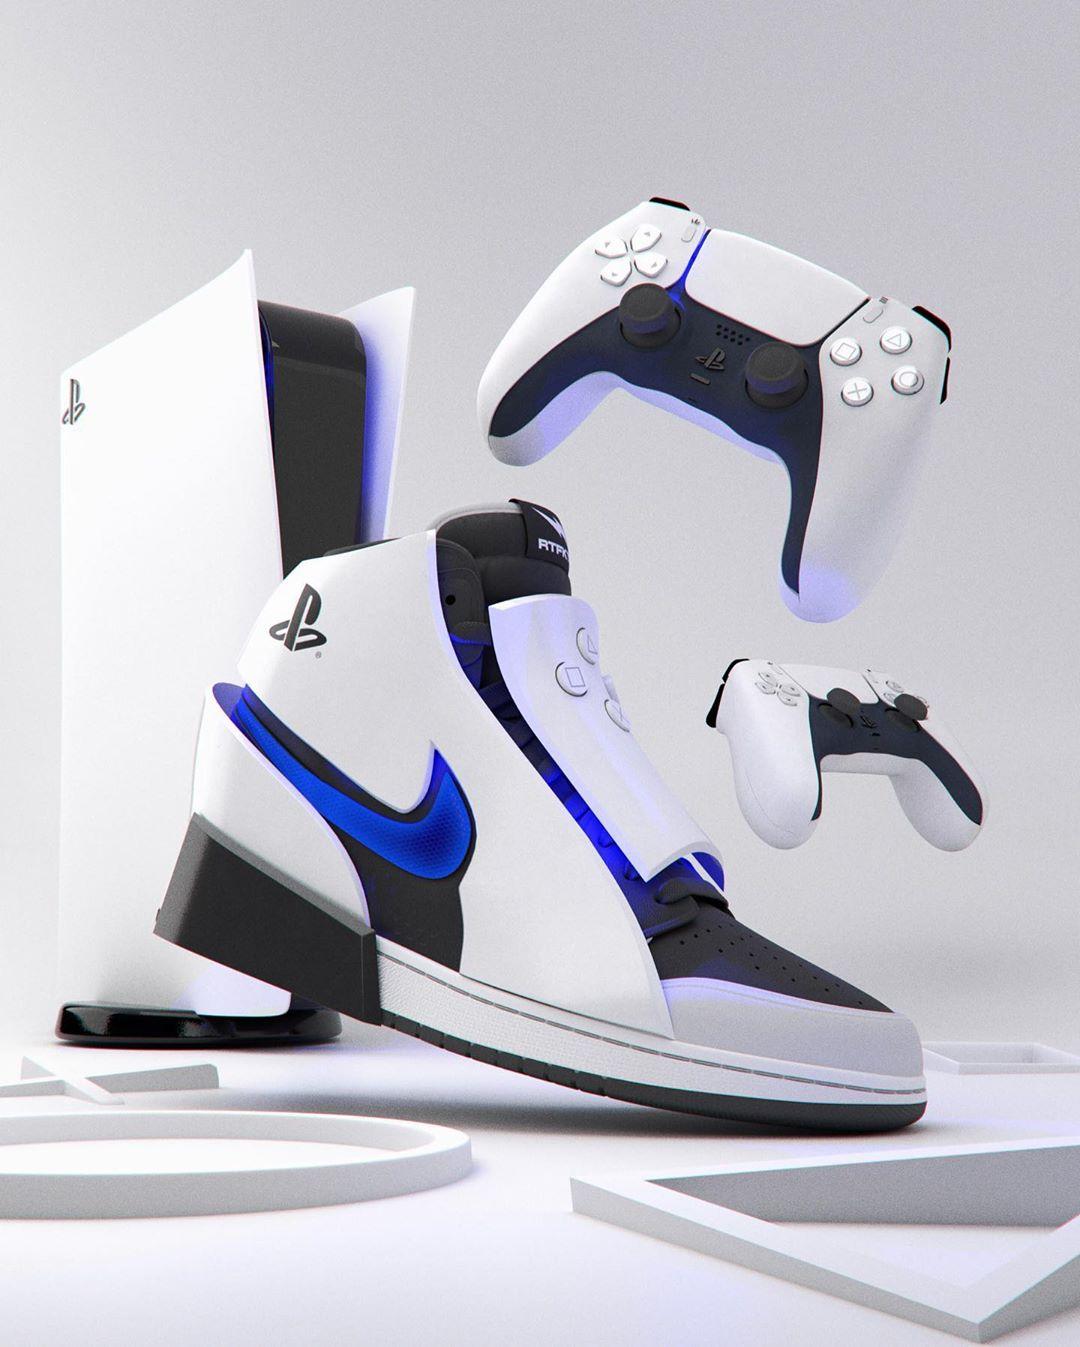 Air Jordan 1 x PlayStation 5 by Chris Le | RESPAWWN